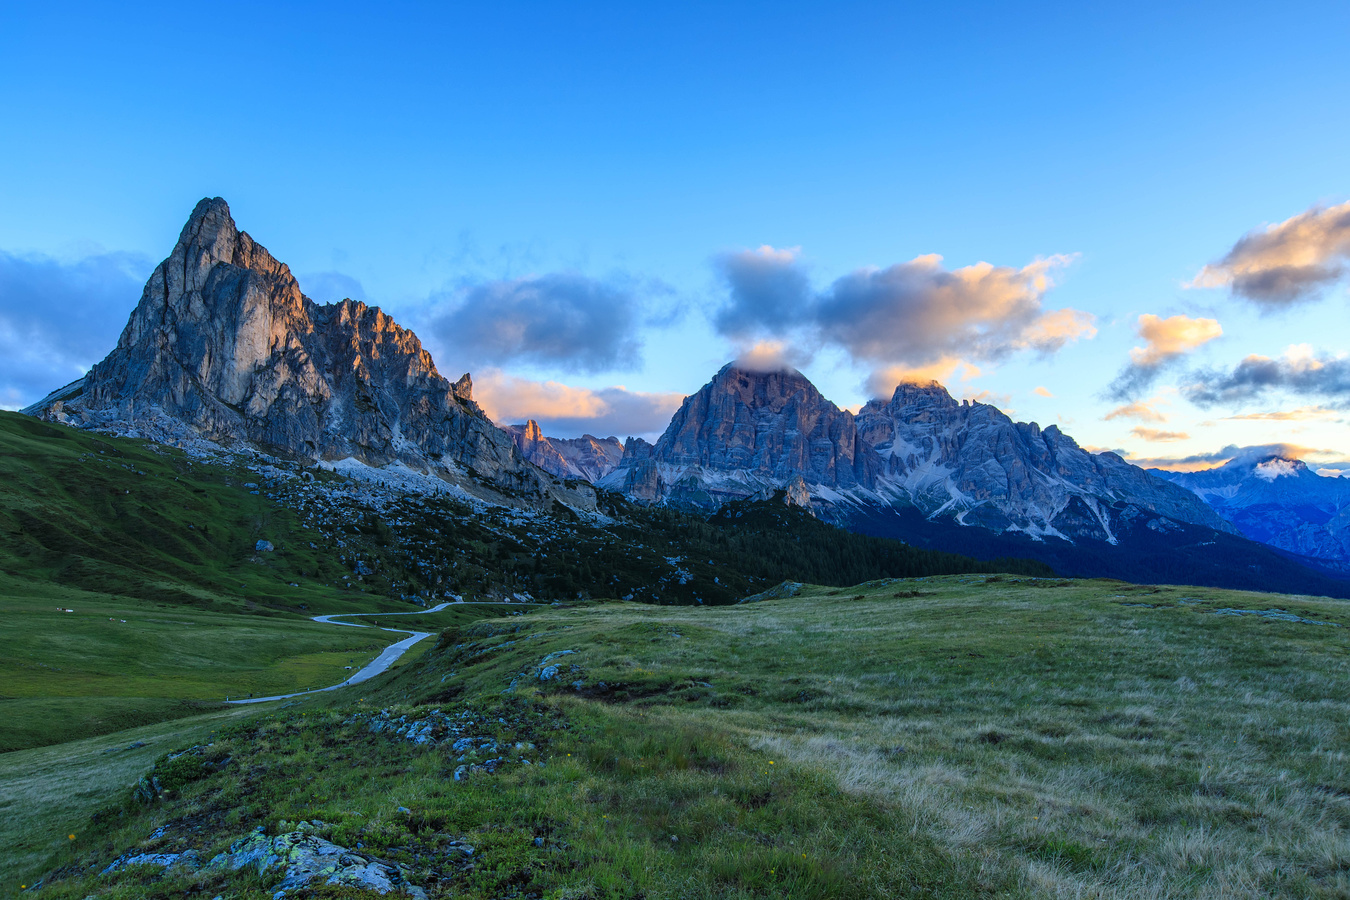 Ra Gusela-paso Giau.Dolomity